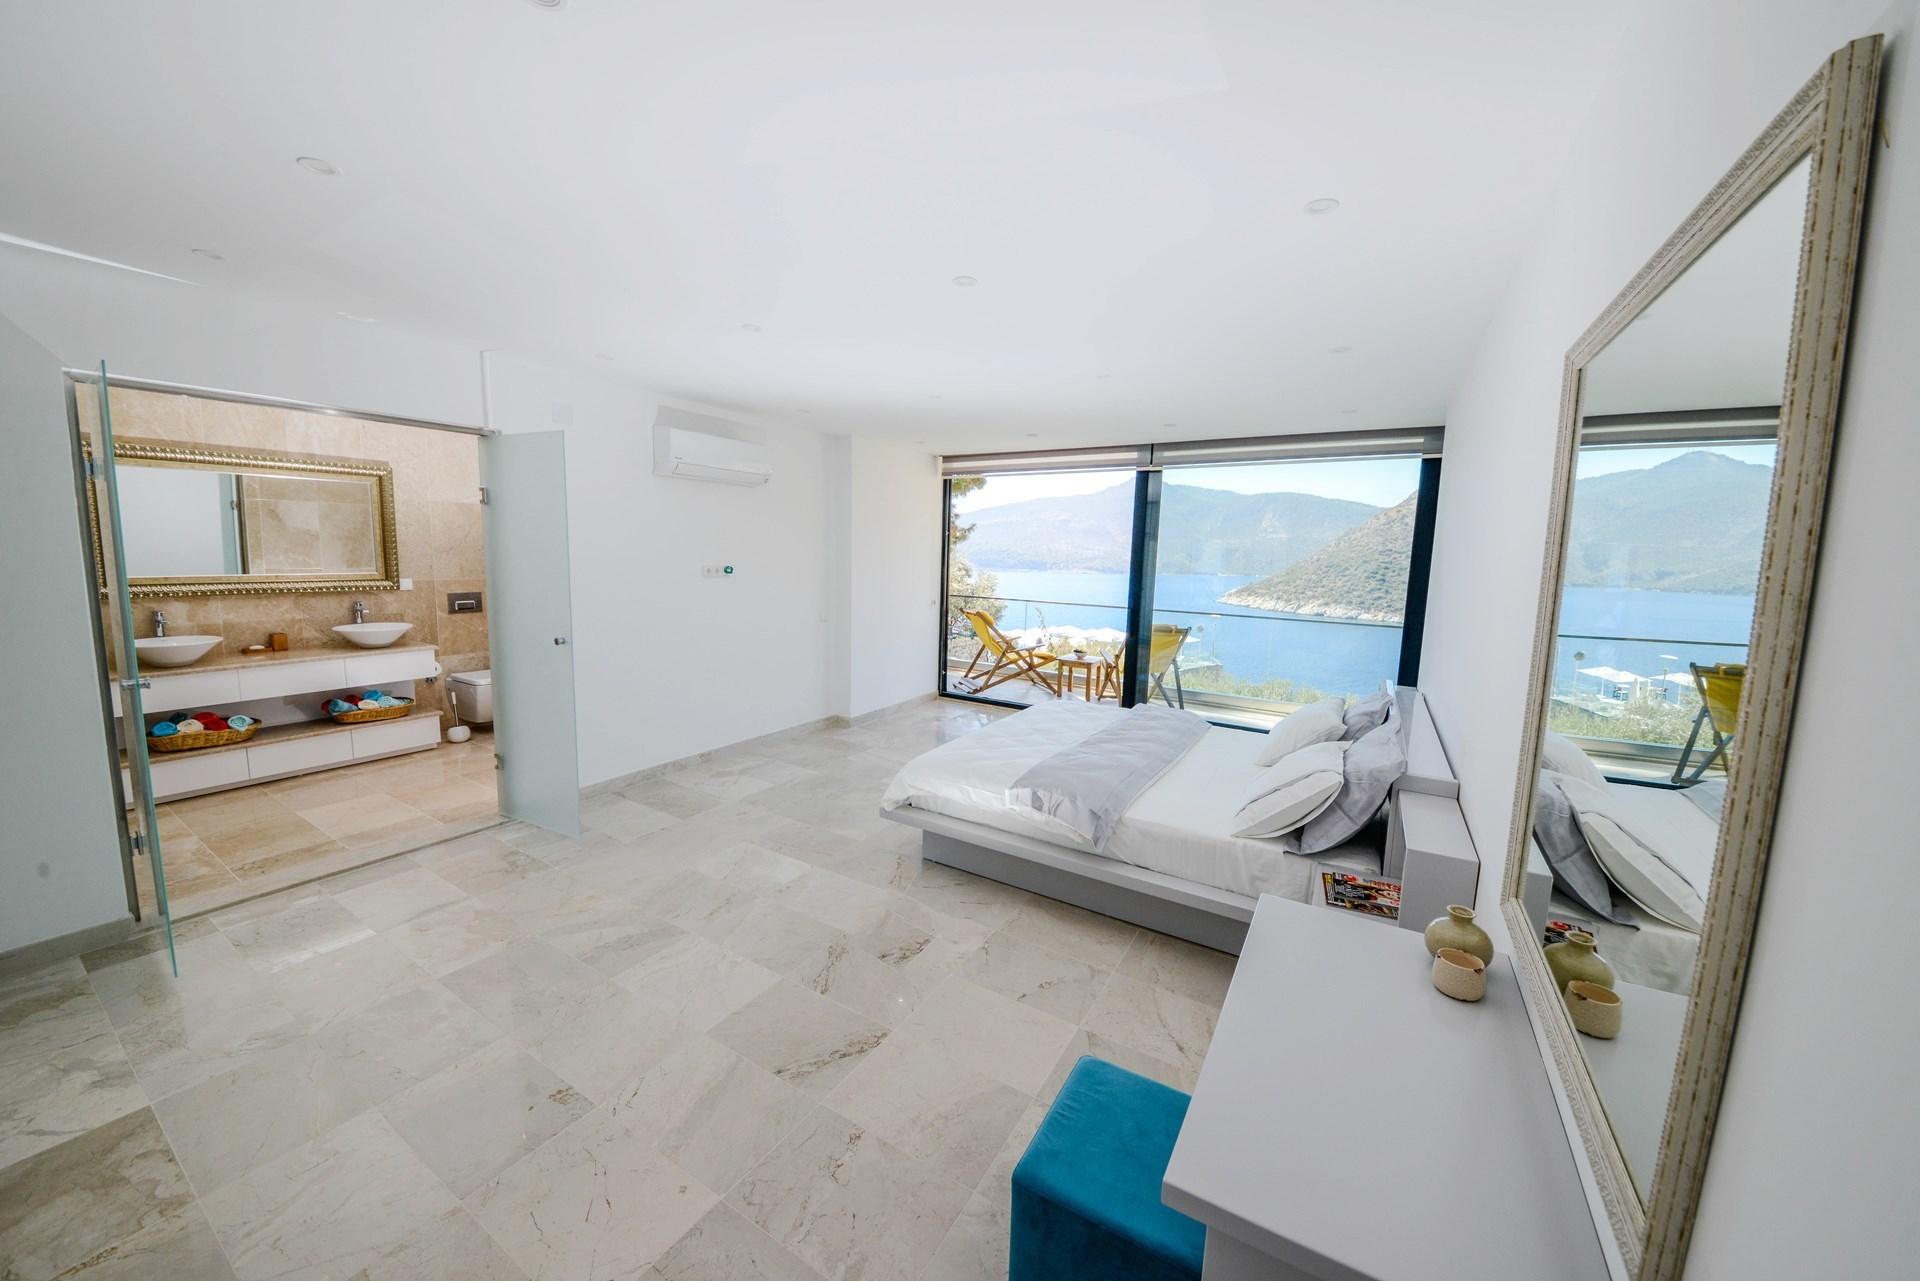 Bedroom_in_Villa_Kalamar,_Kalkan_Kas_and_Islamlar,_Turkey.jpg